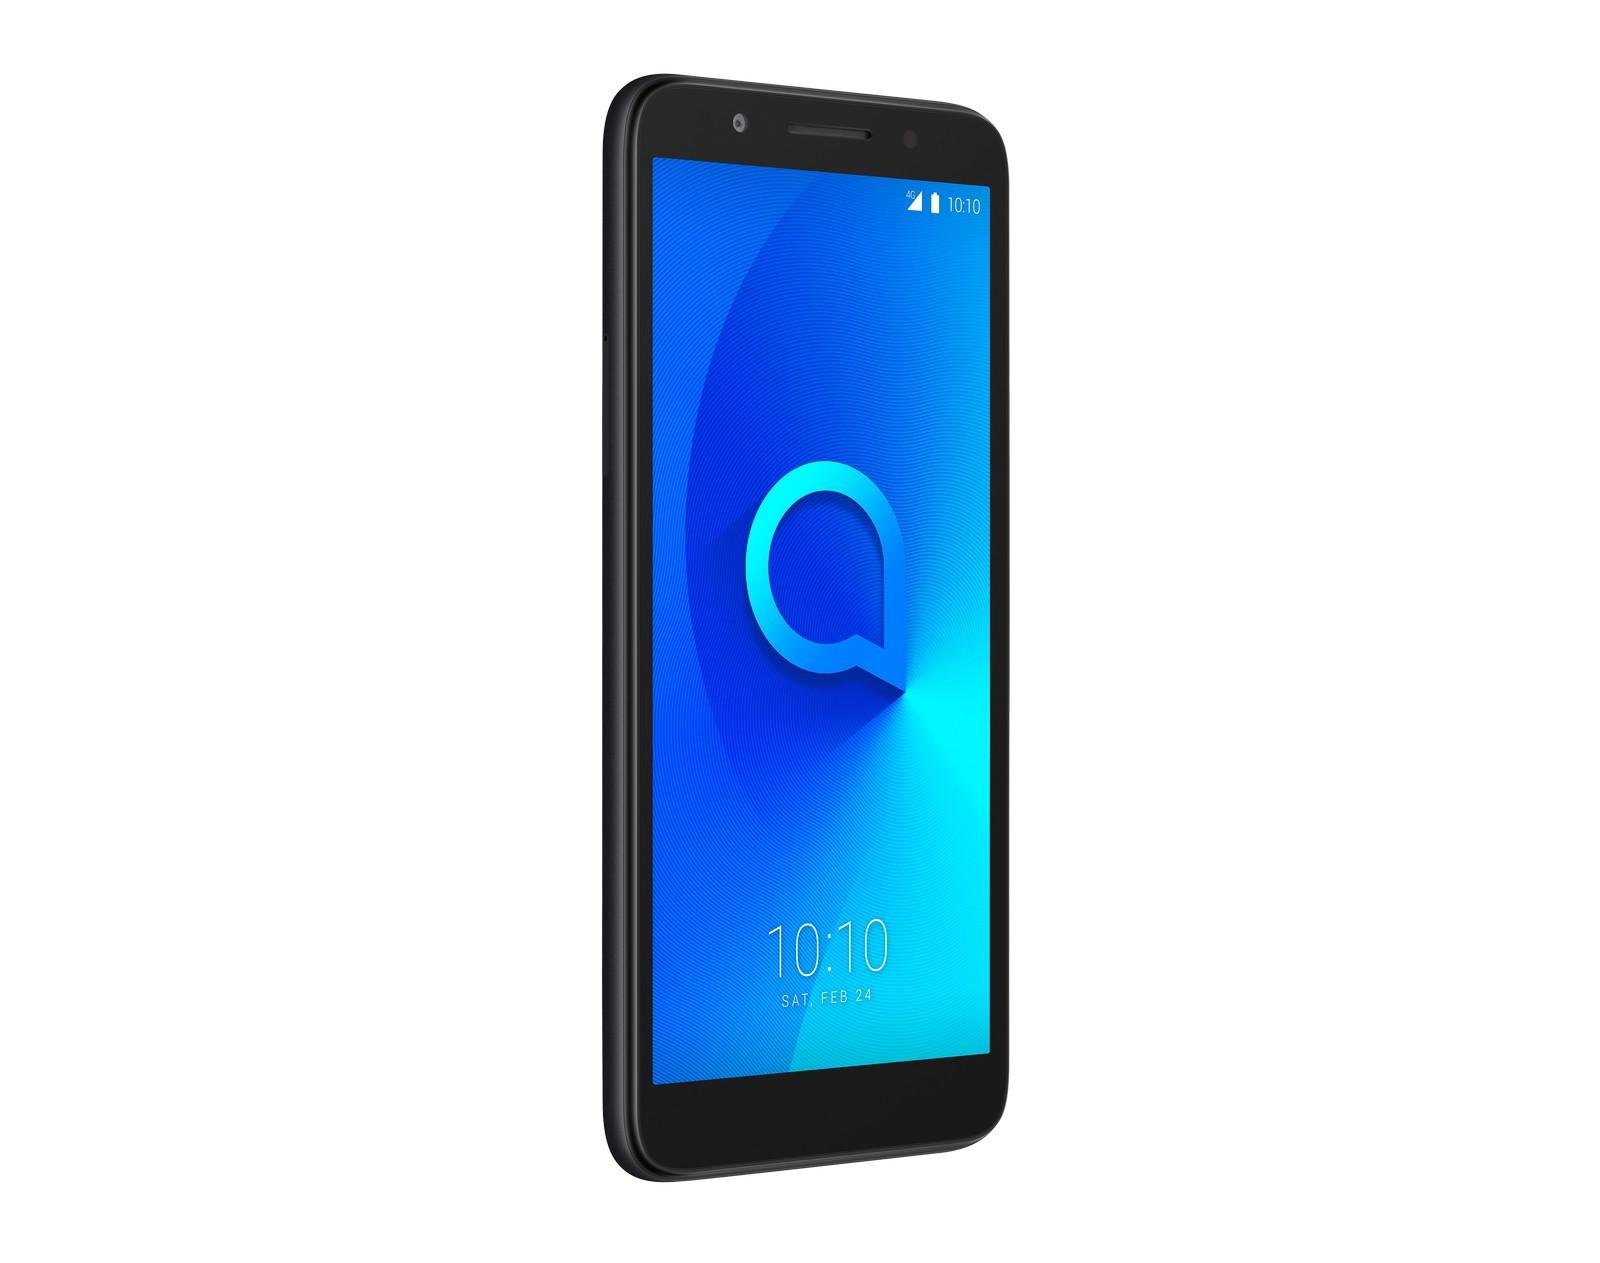 Alcatel's new smartphones start at under $100